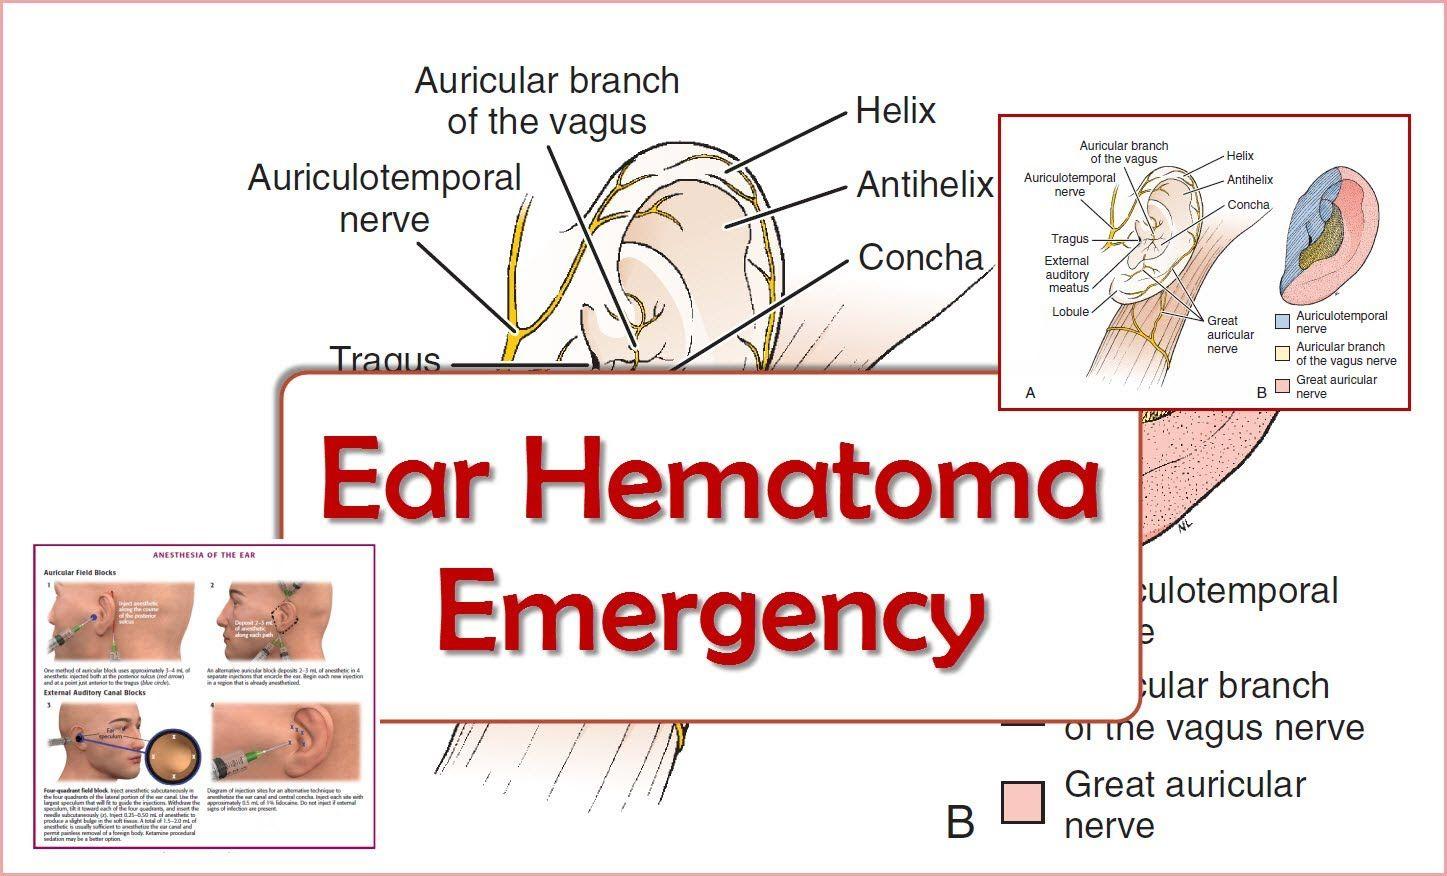 Ear hematoma emergency vagus nerve emergency emergency